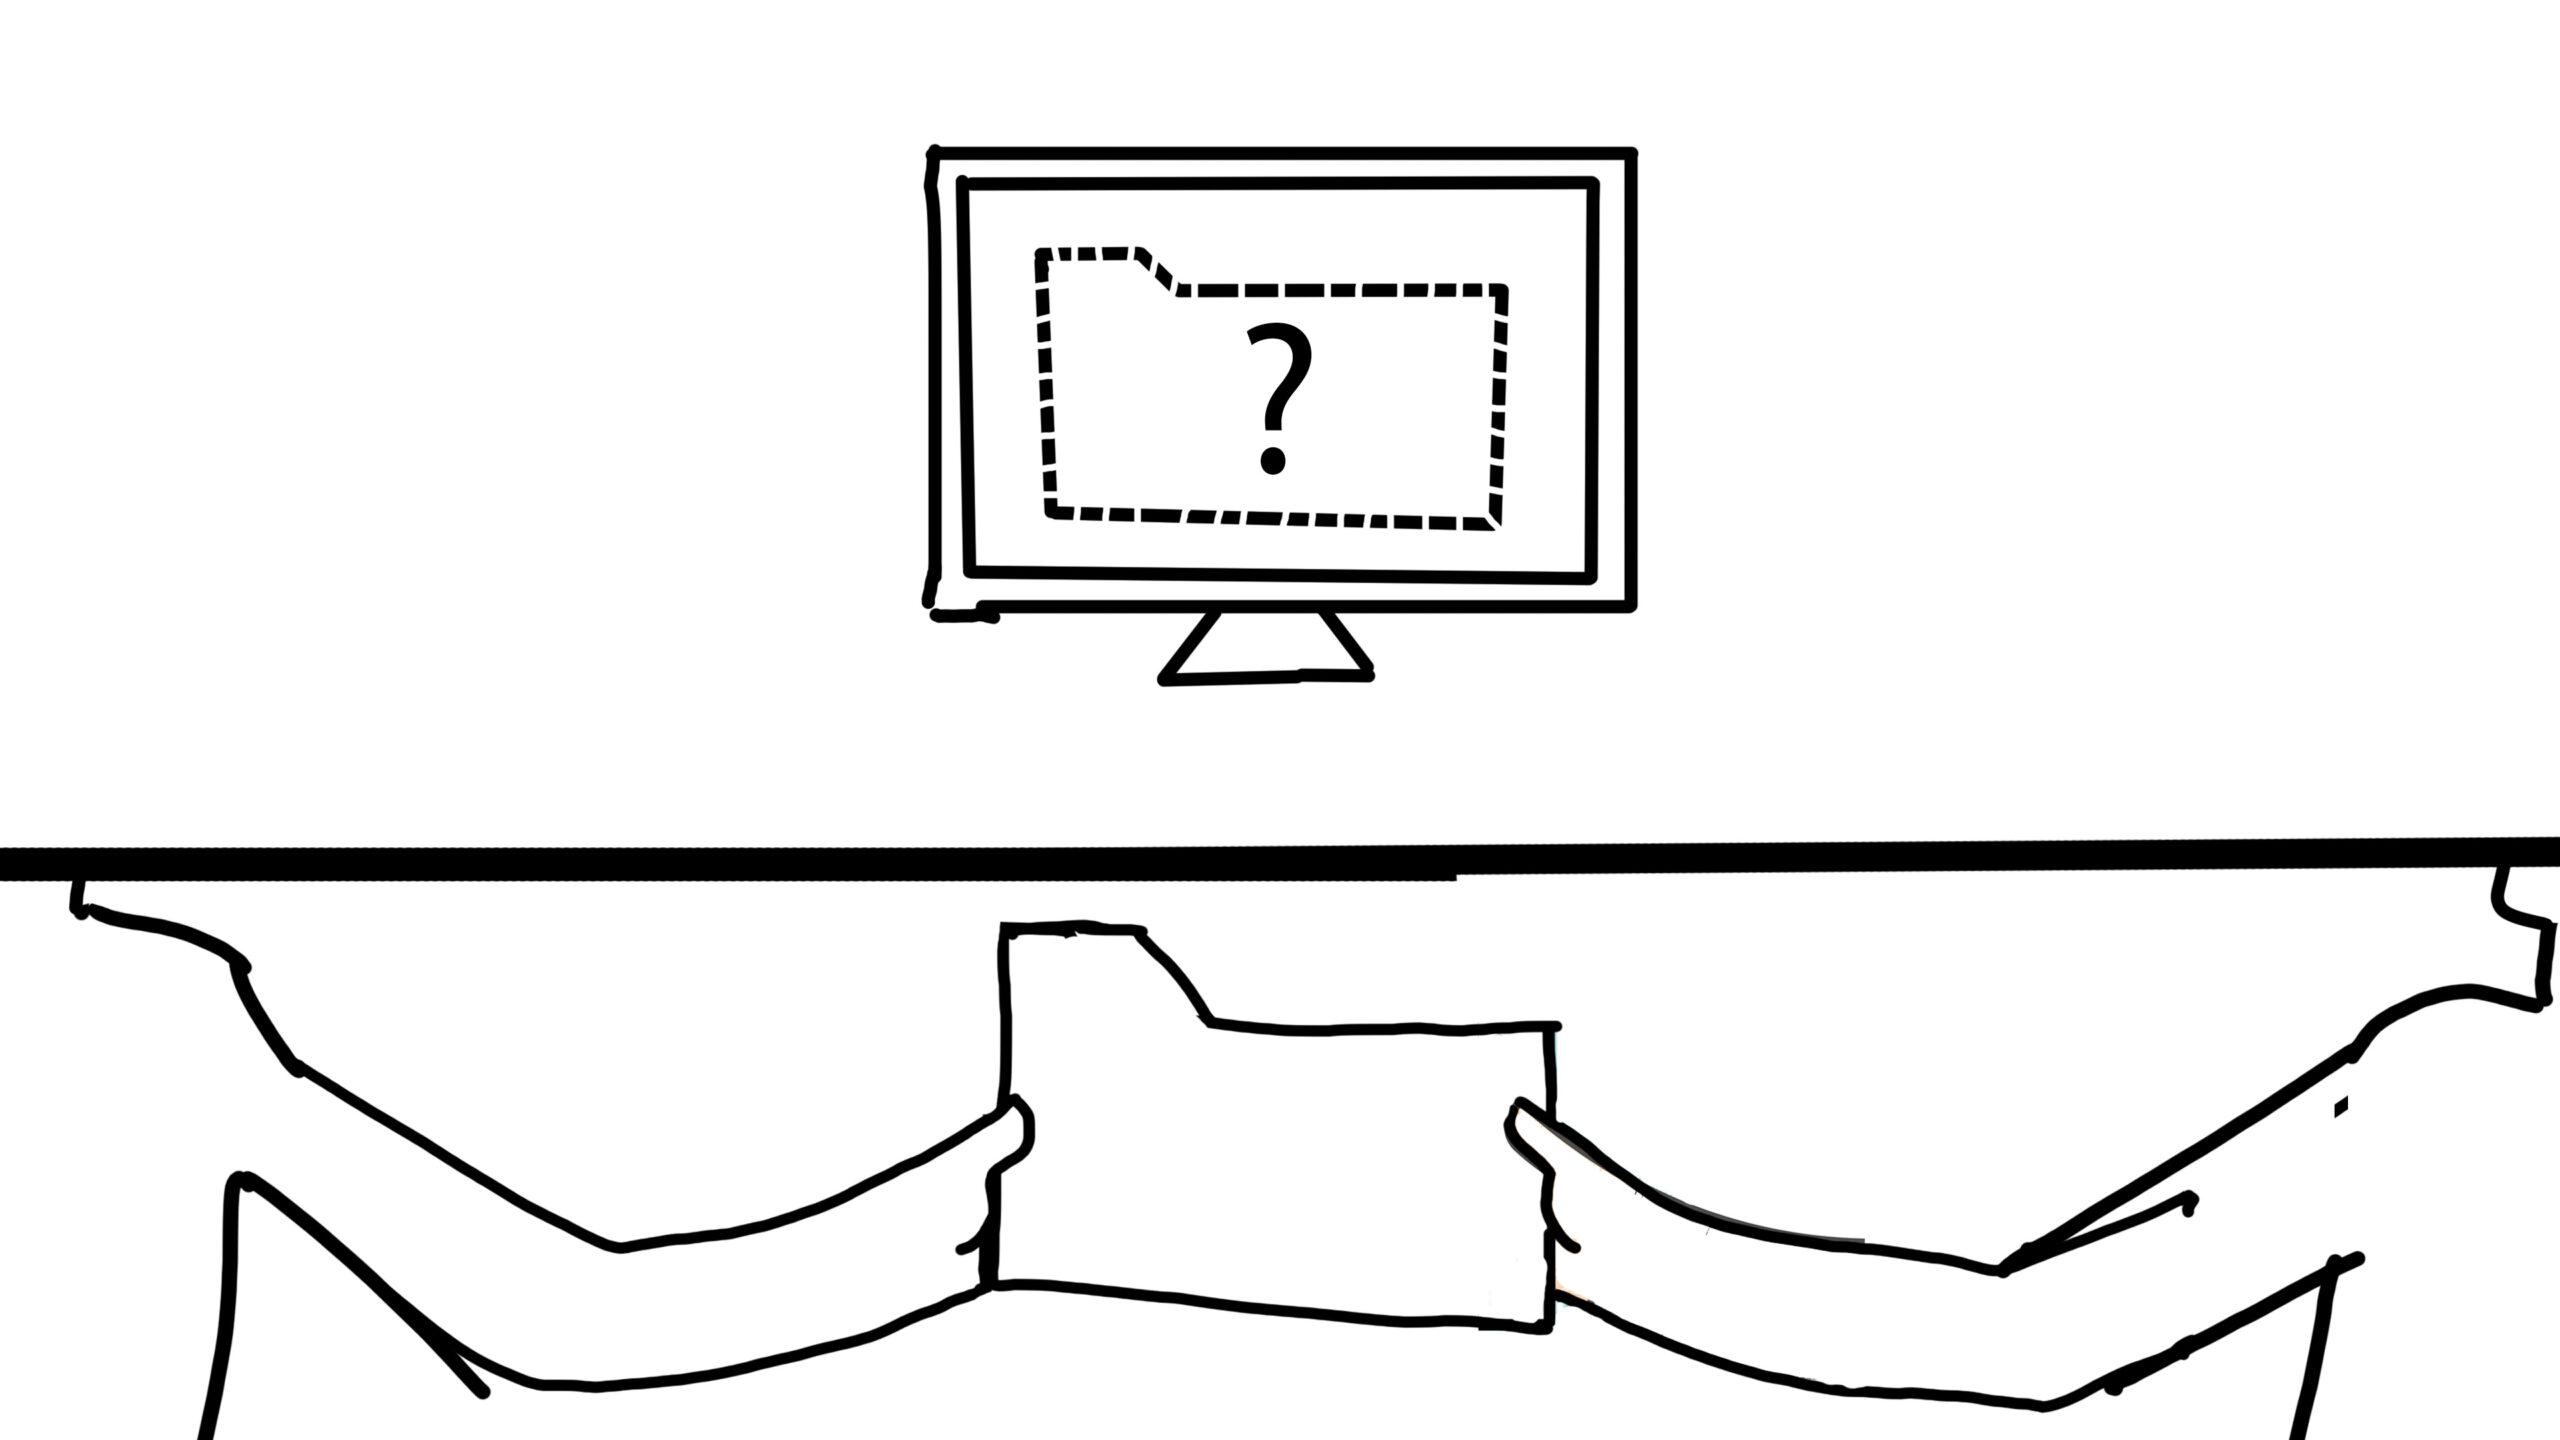 Privacy_Incident_Sketchboard_0304